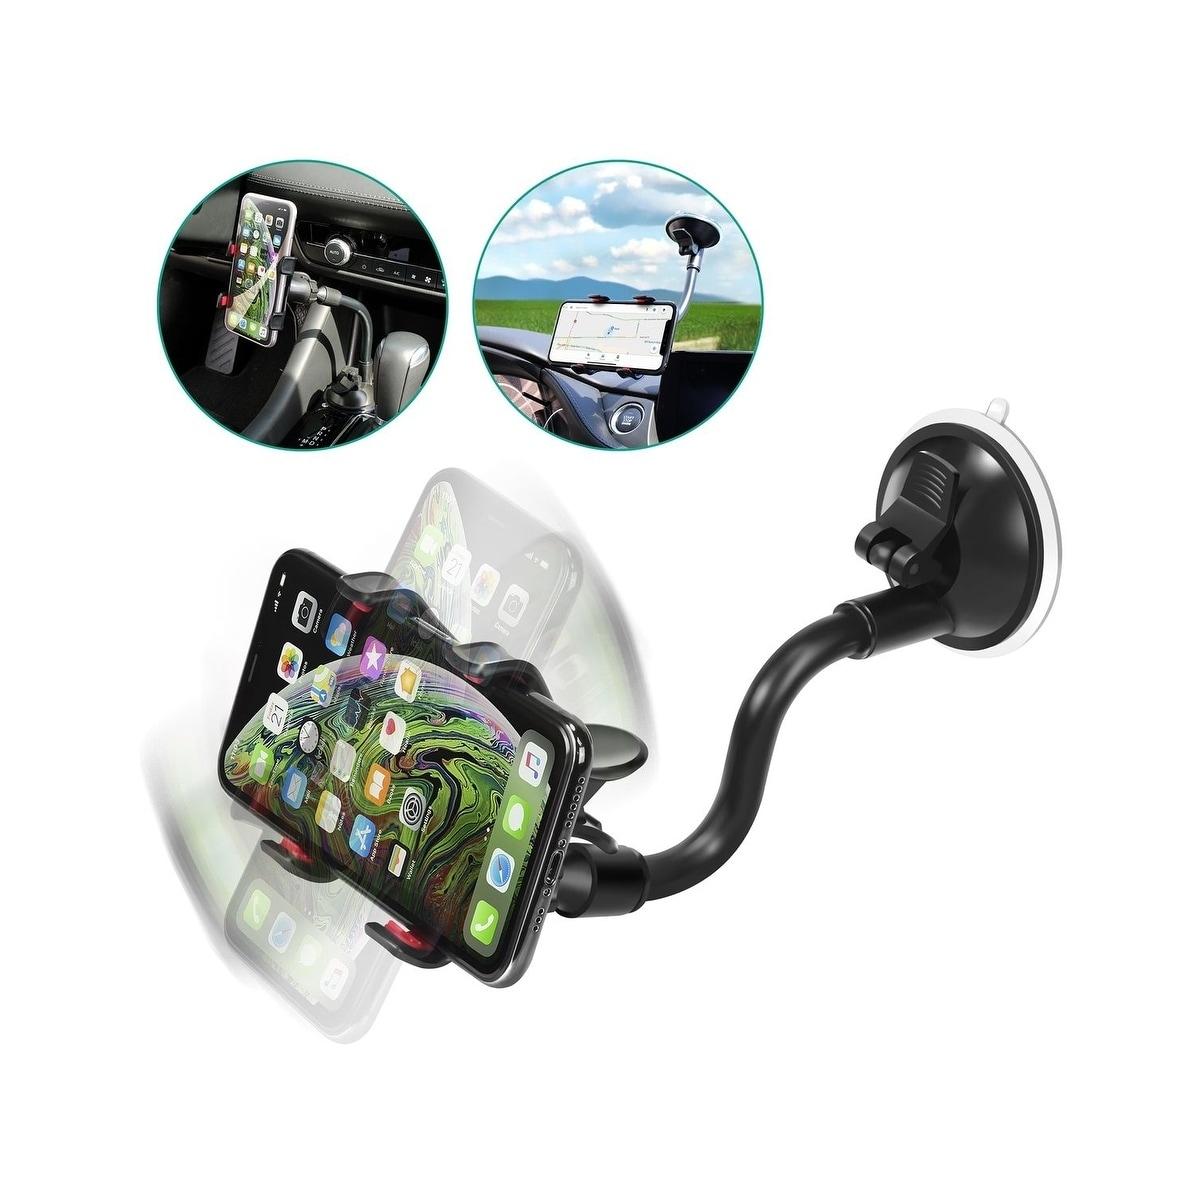 Insten Black Universal 360-degree Adjustable Rotatable Ca...